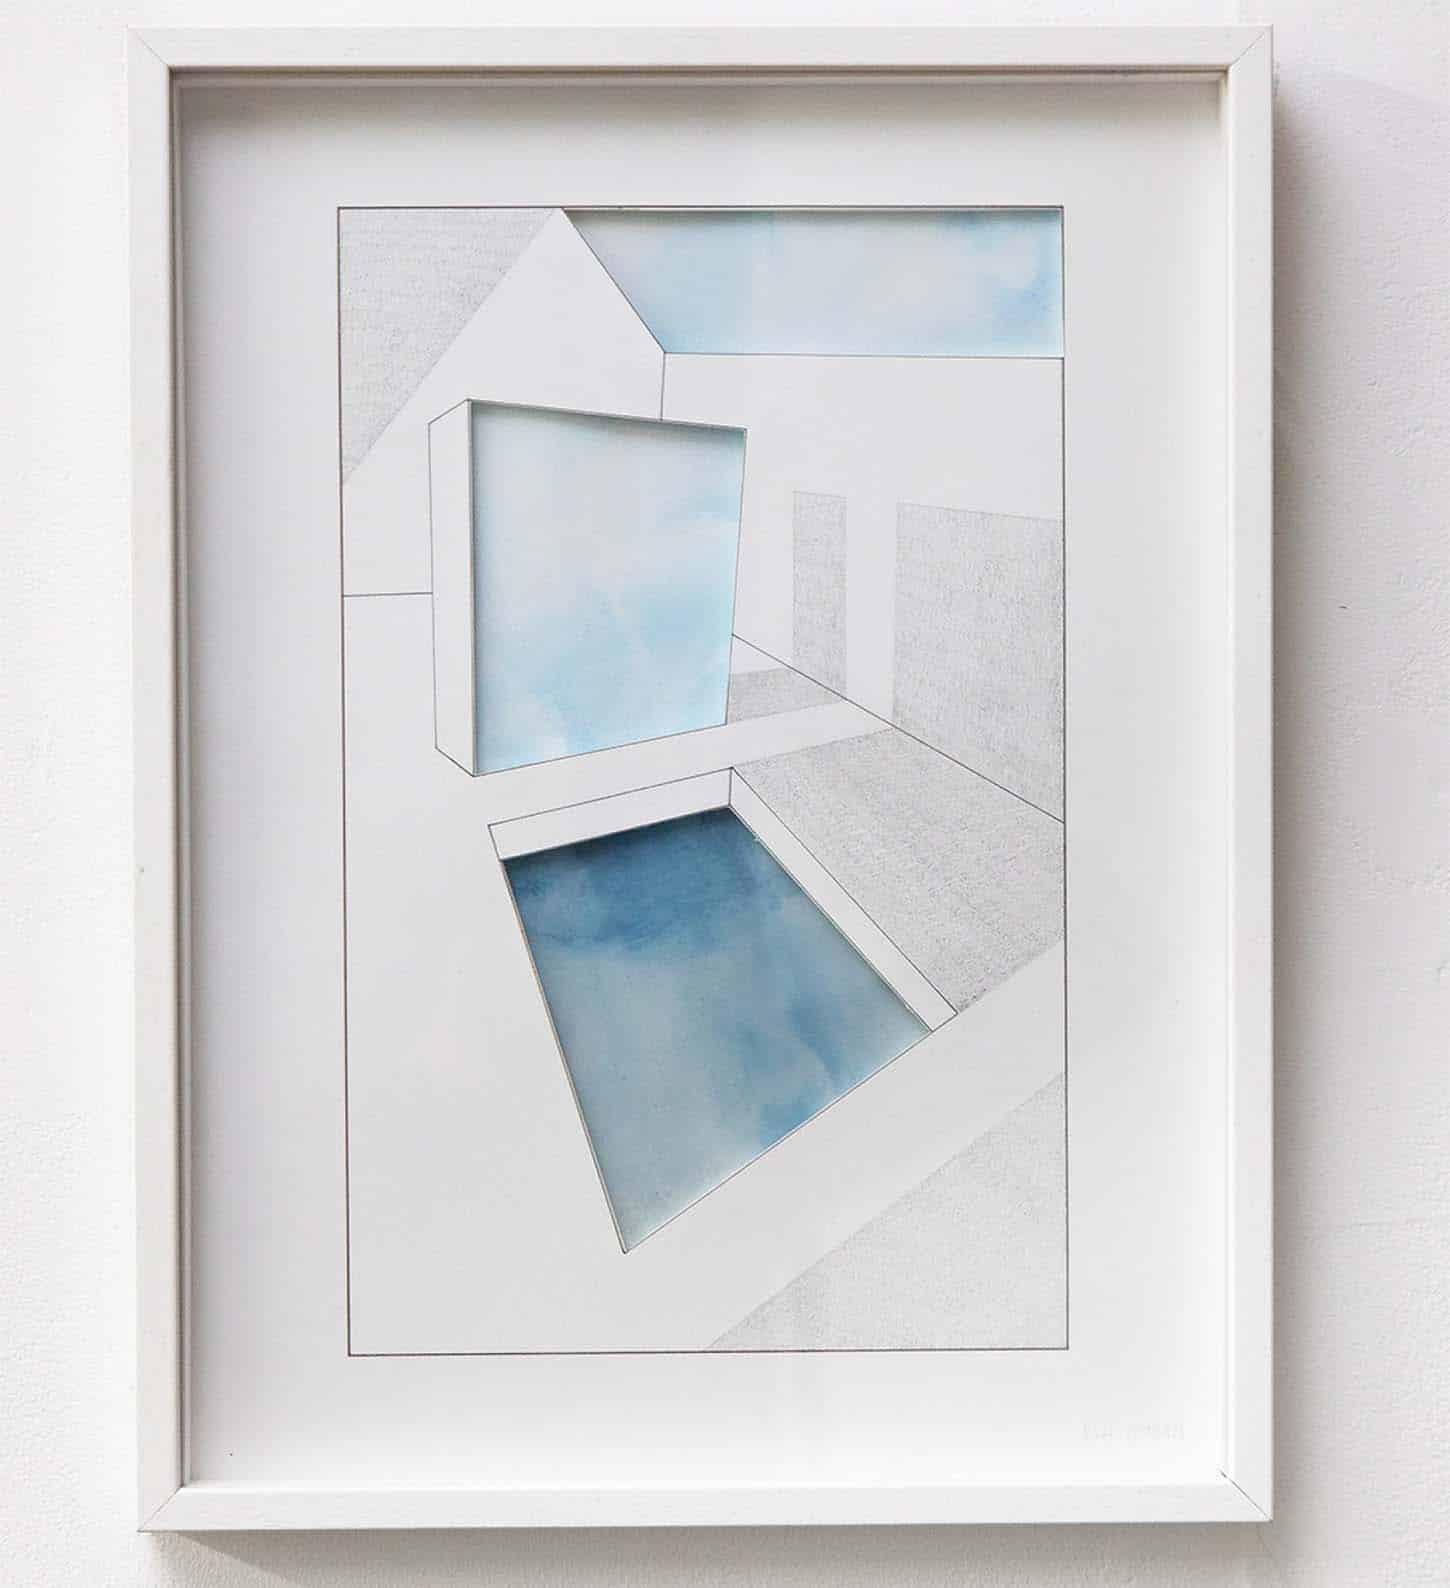 Eva Medin, Abyssal Spaces - Floa-ting mountains, 20 x 30 cm